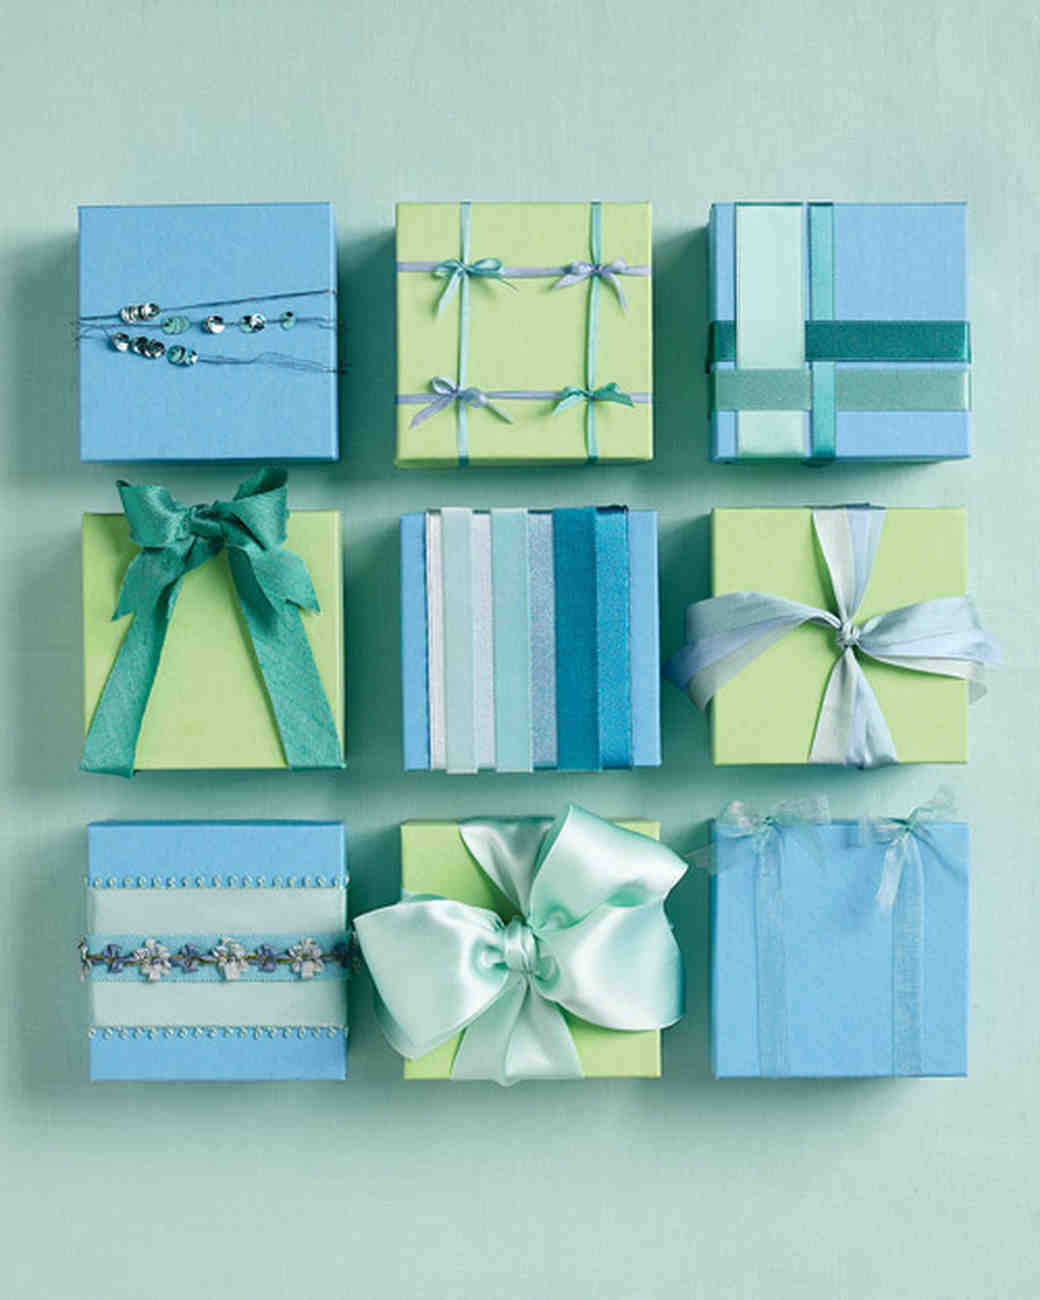 mwd104718_sum09_boxes1.jpg